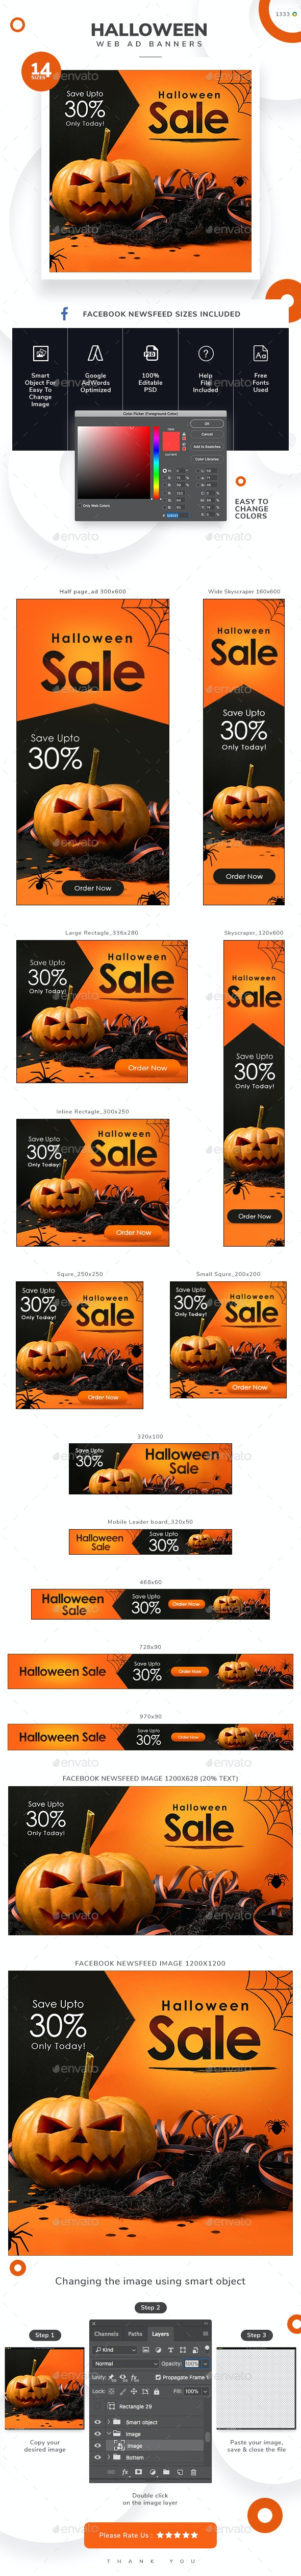 Halloween Sale Web Banner Set - Banners & Ads Web Elements